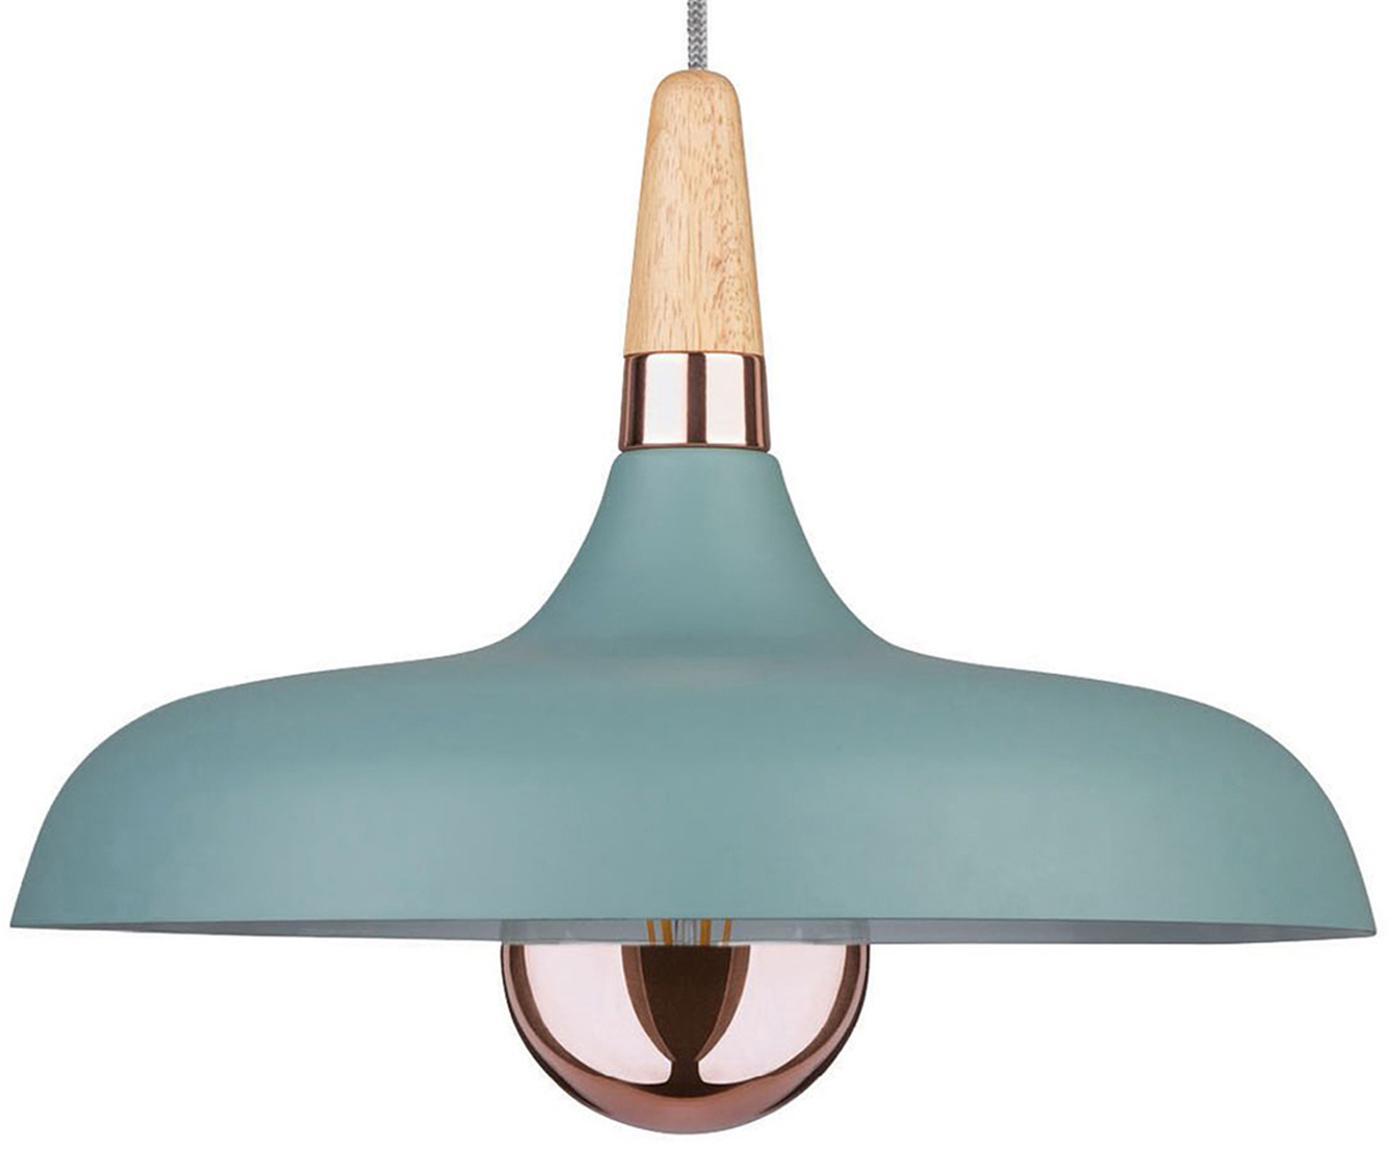 Scandi hanglamp Juna, Turquoise, Ø 34 x H 23 cm